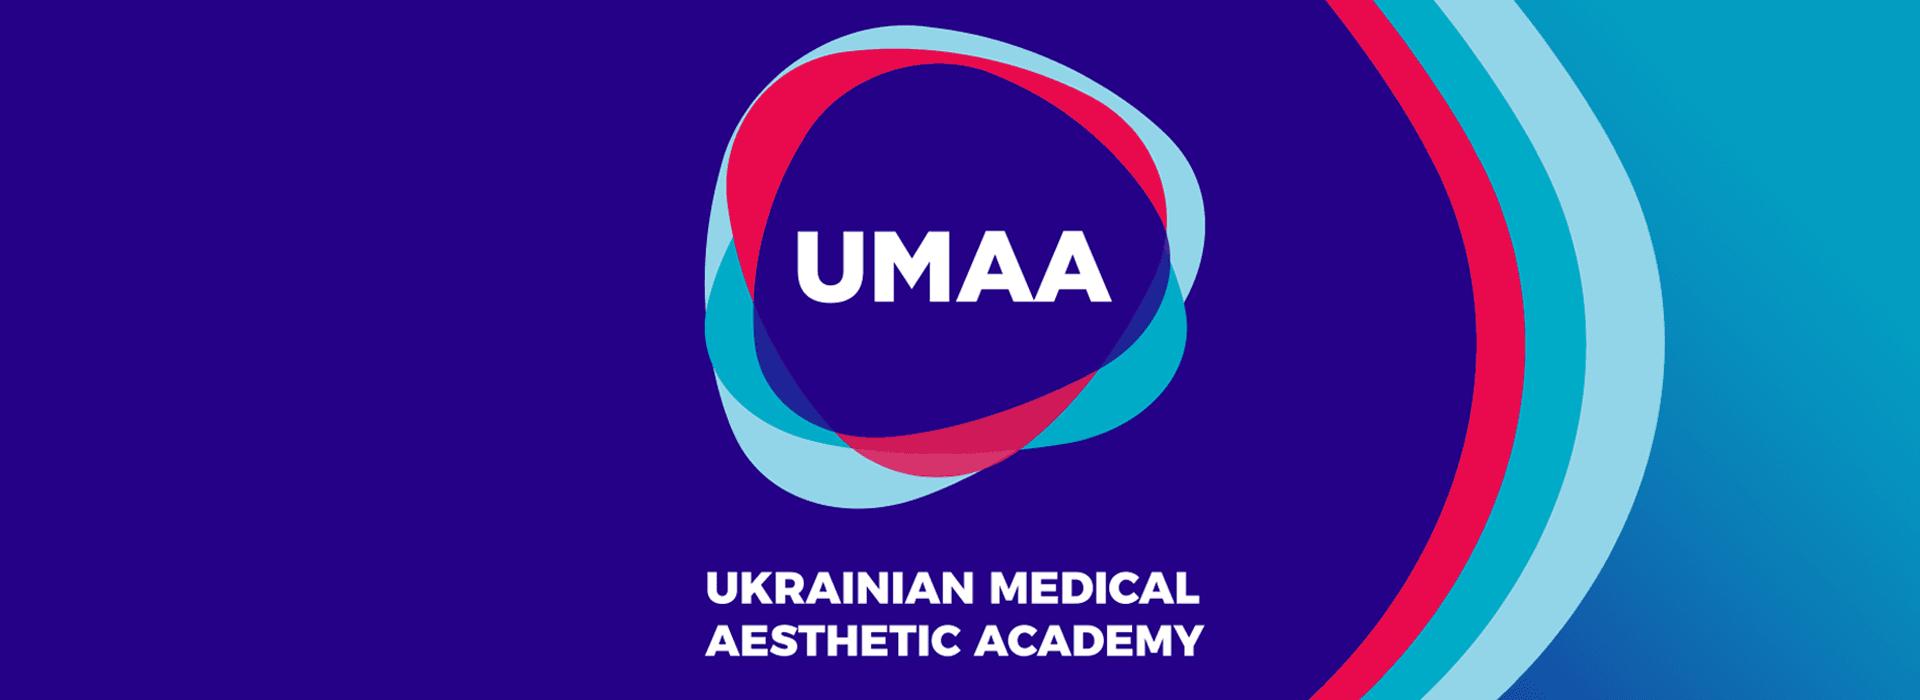 UMAA academy logo